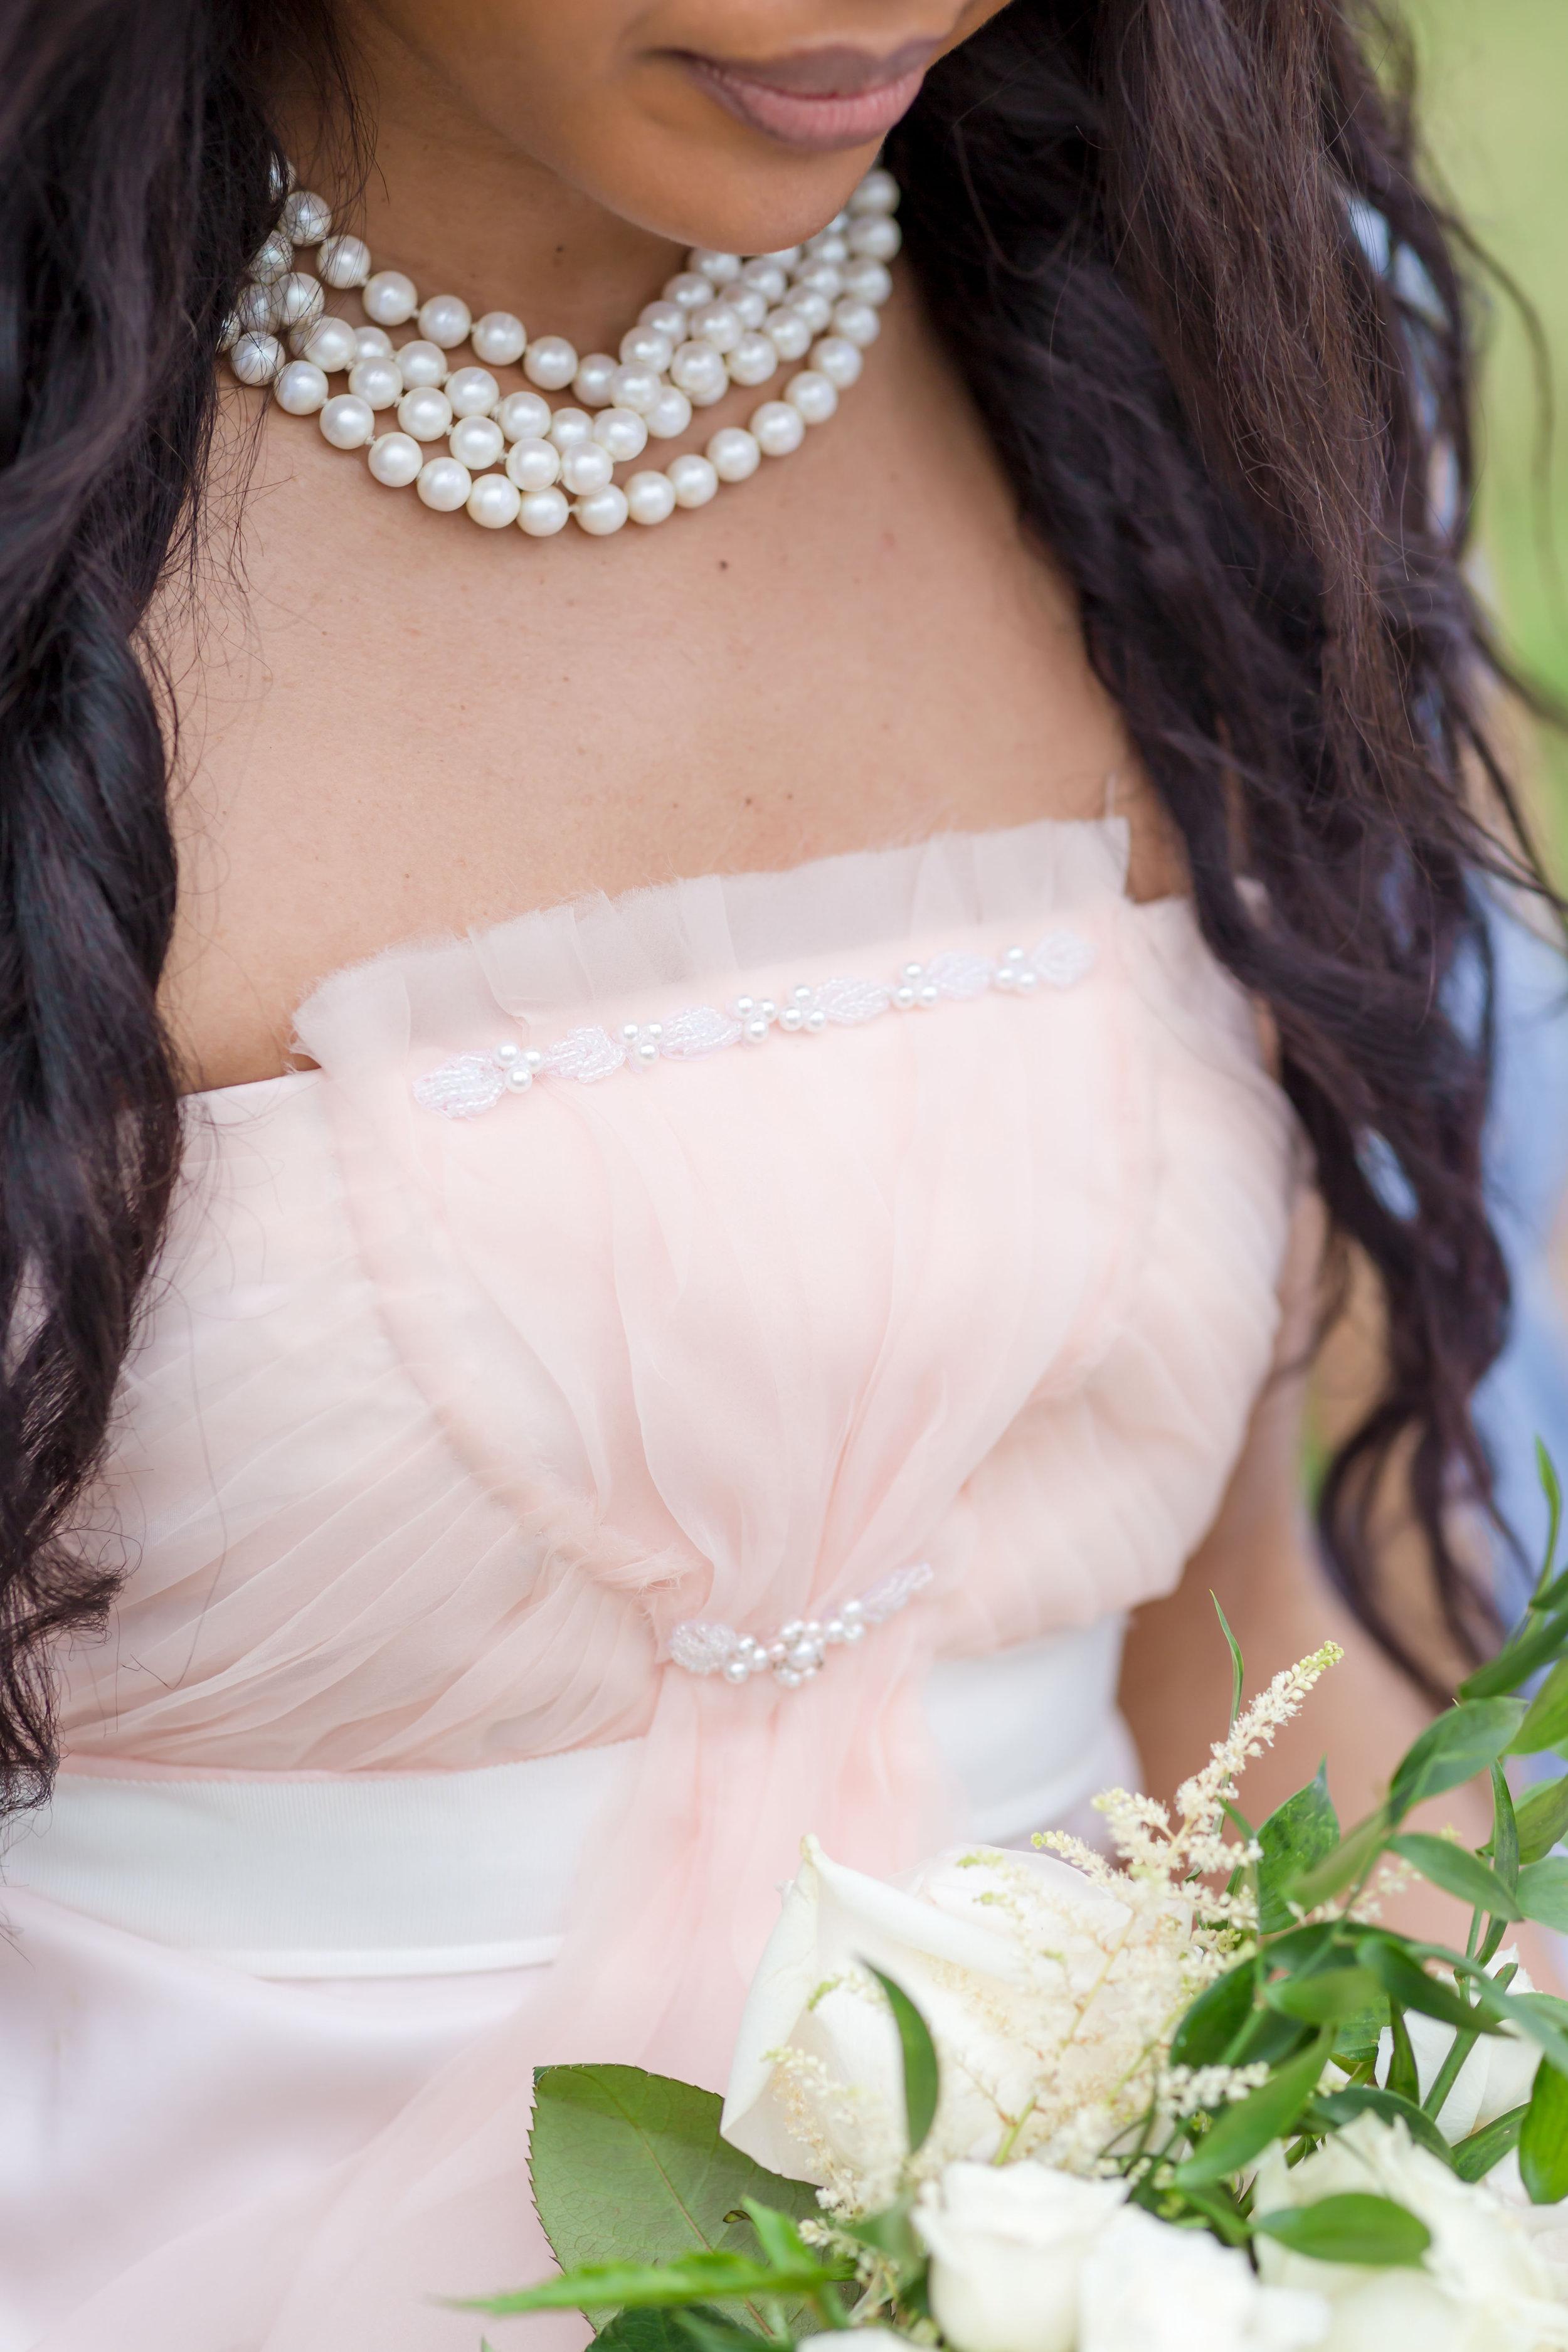 ScarlettExpressions-StyledShoot-Bridal-91.jpg